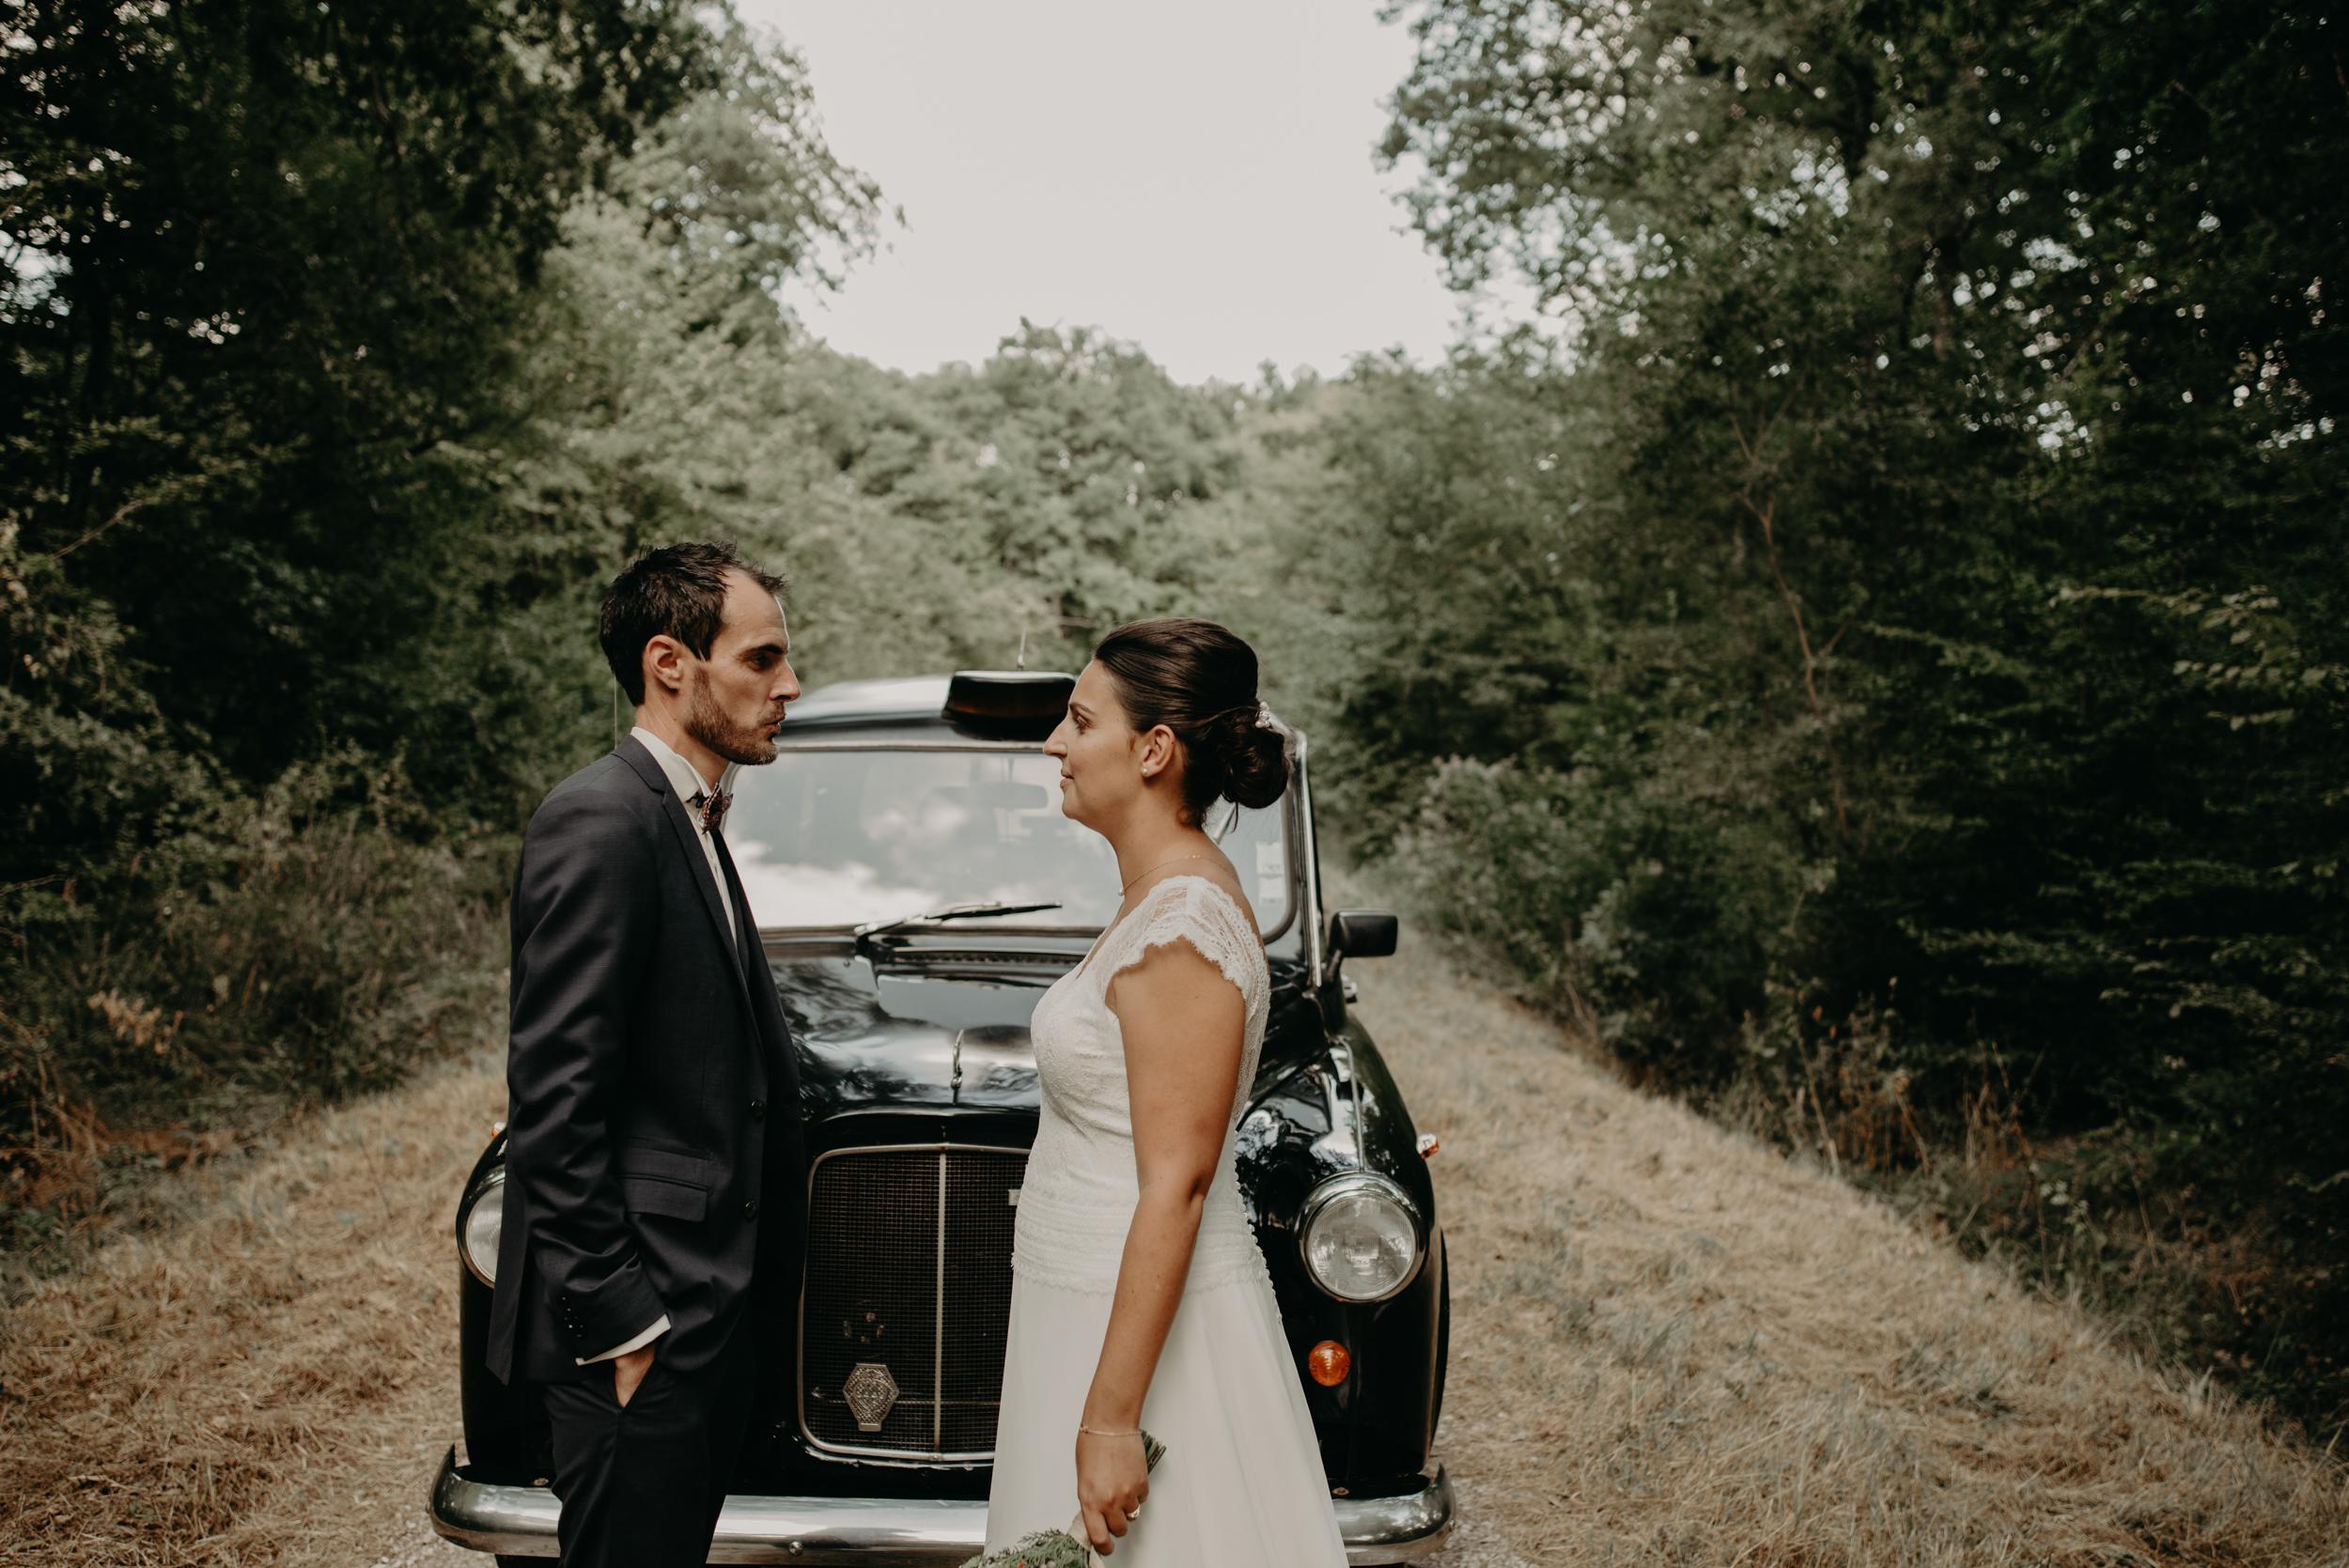 mariage mariages wedding weddings taxi anglais black cab cab of London cab anglais taxi londonien événement event taxi anglais avec clim